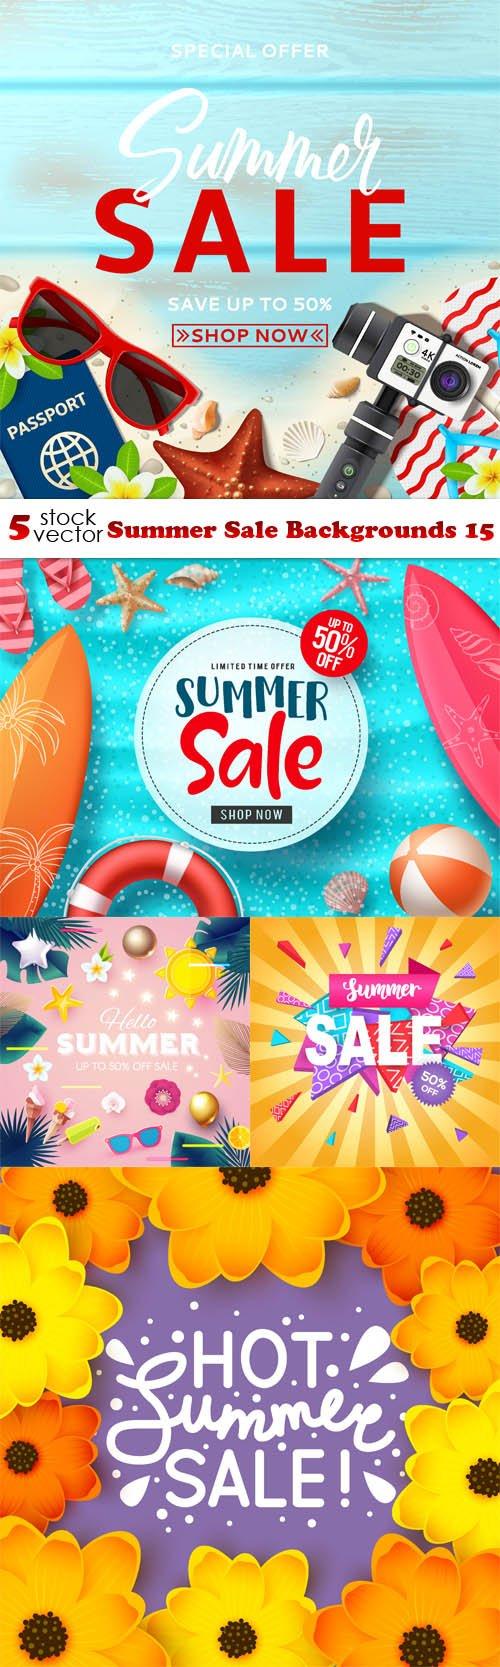 Vectors - Summer Sale Backgrounds 15